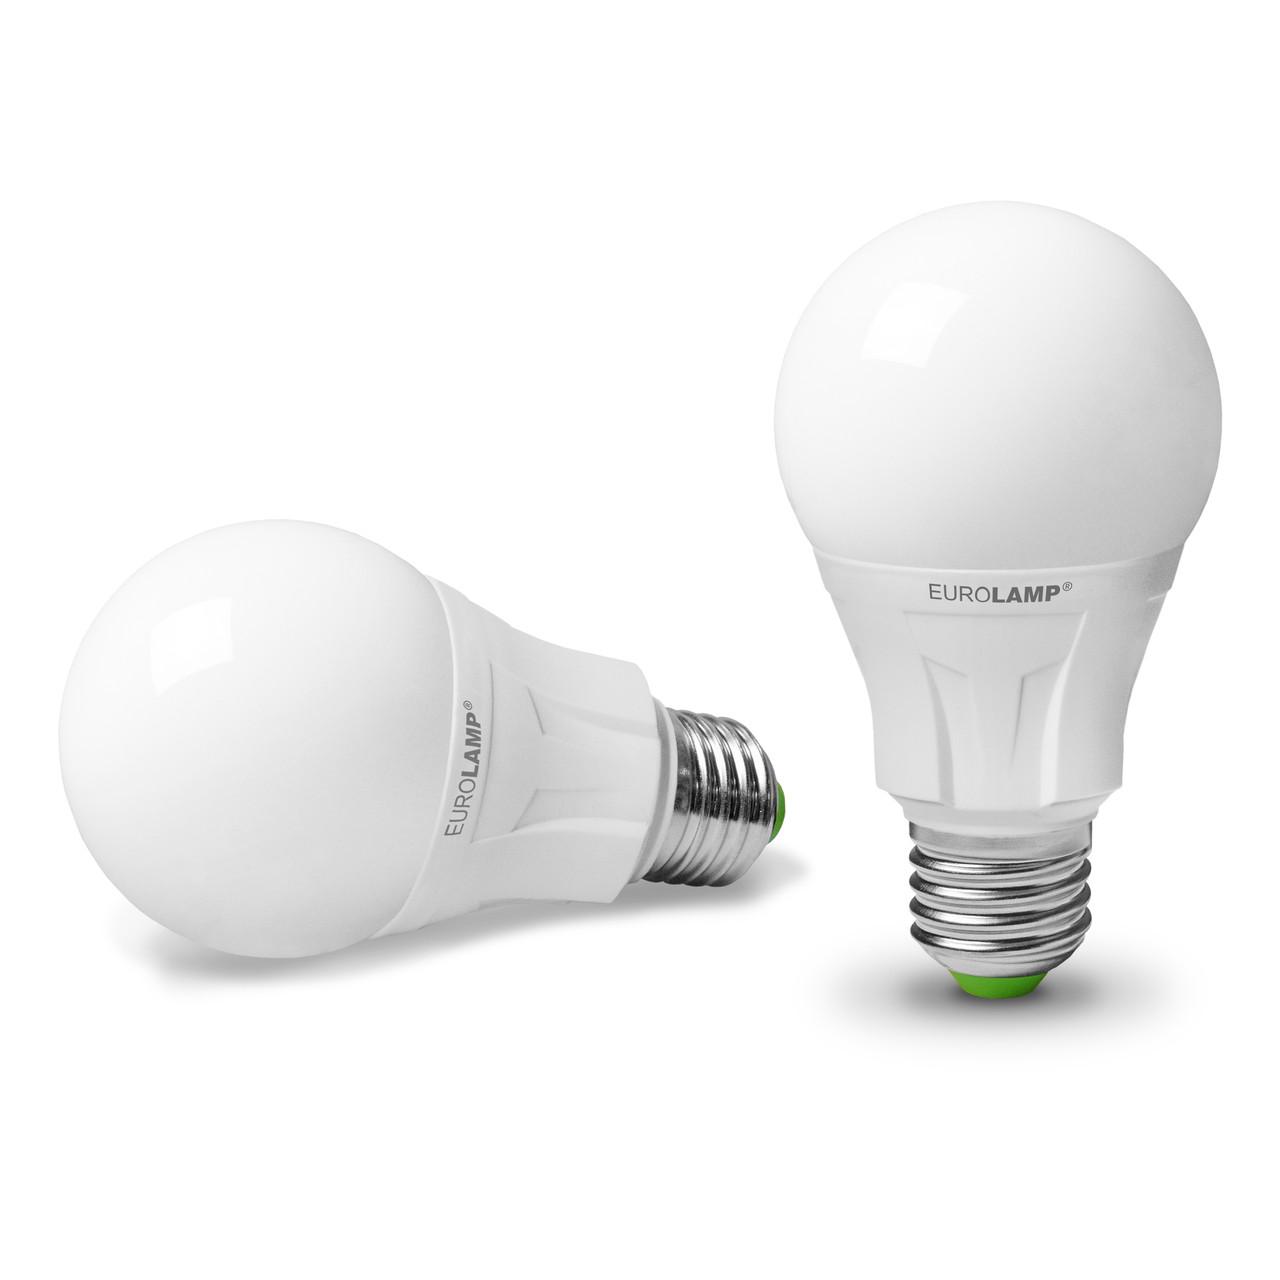 EUROLAMP LED Лампа TURBO NEW dimmable А60 10W E27 4000К, фото 1